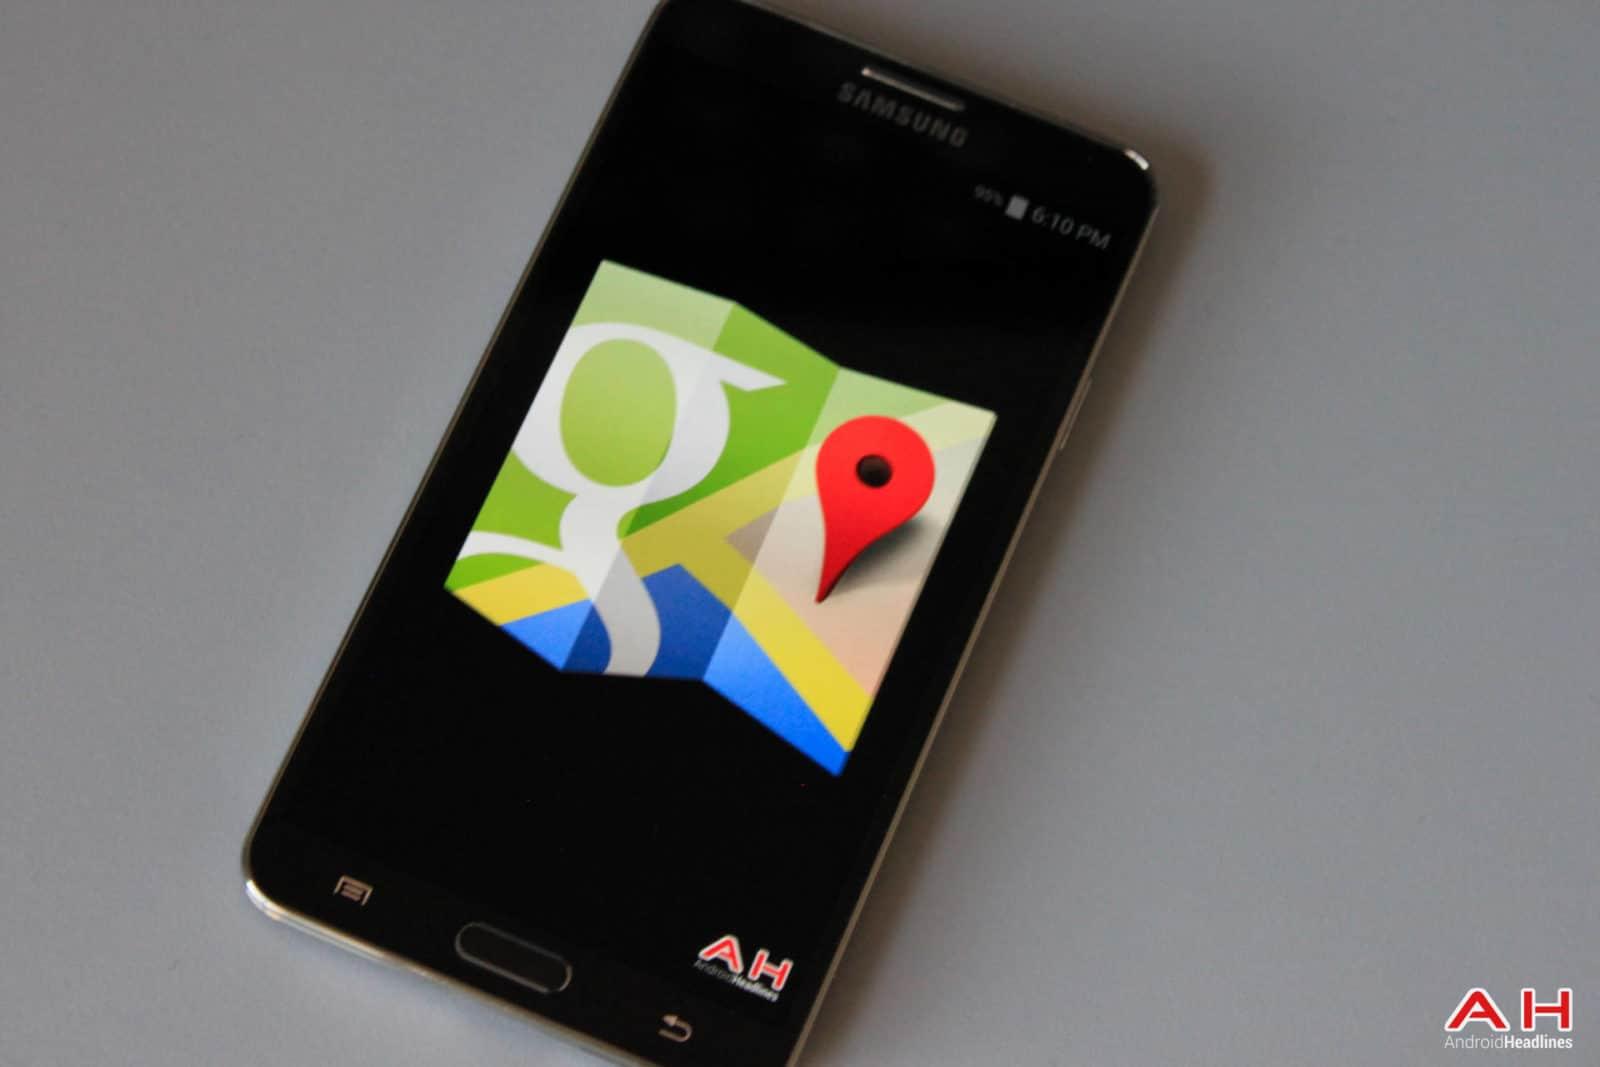 AH Google Maps 1.0